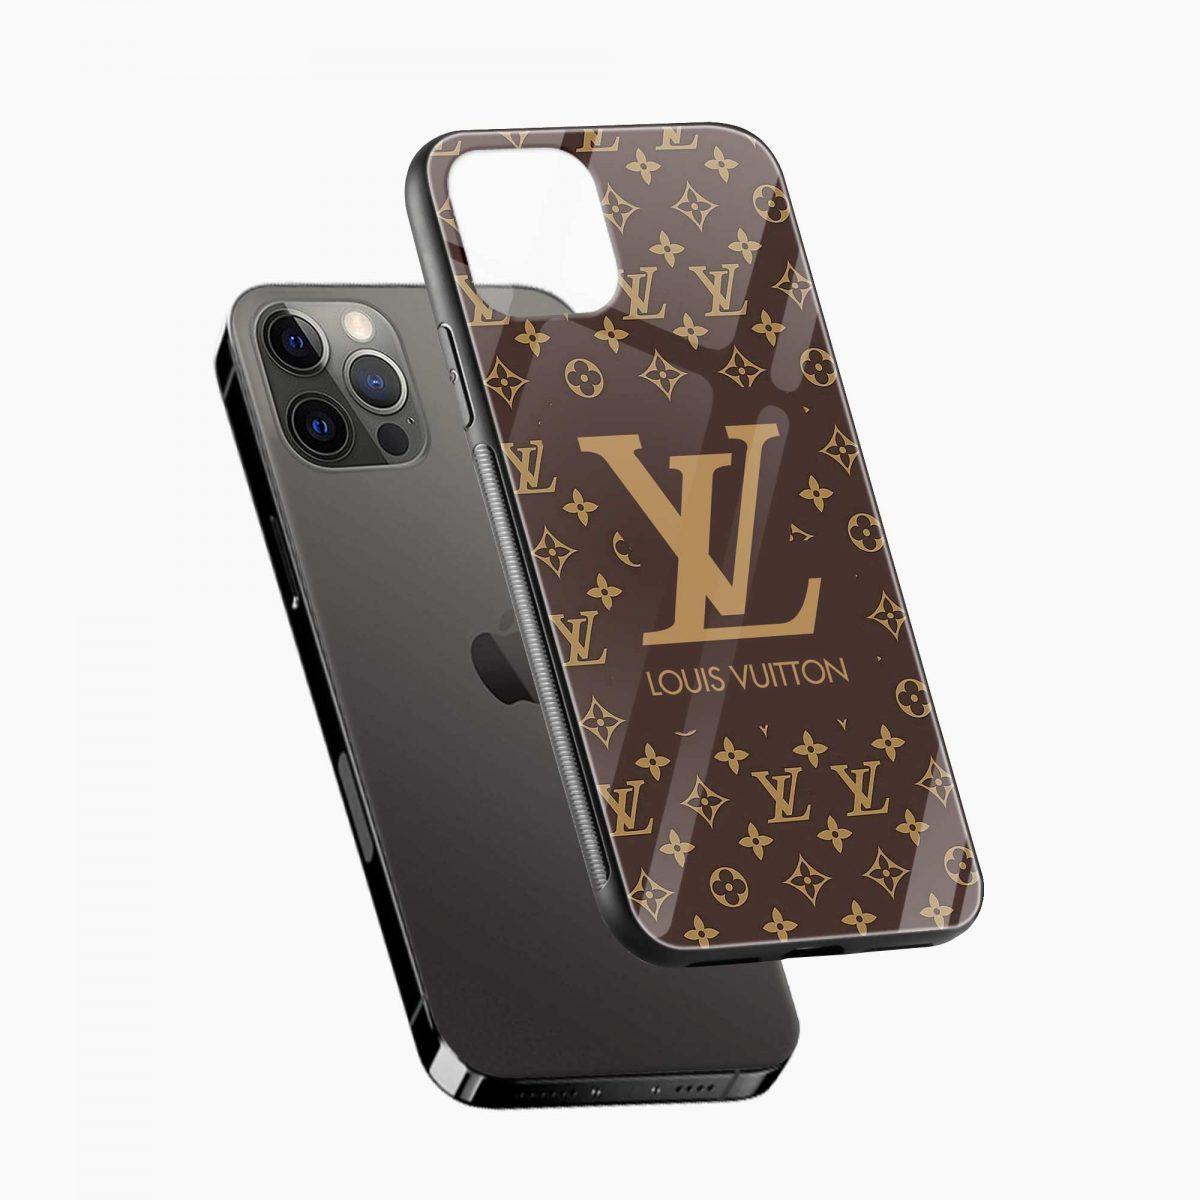 louis vuitton iphone pro back cover diagonal view 1